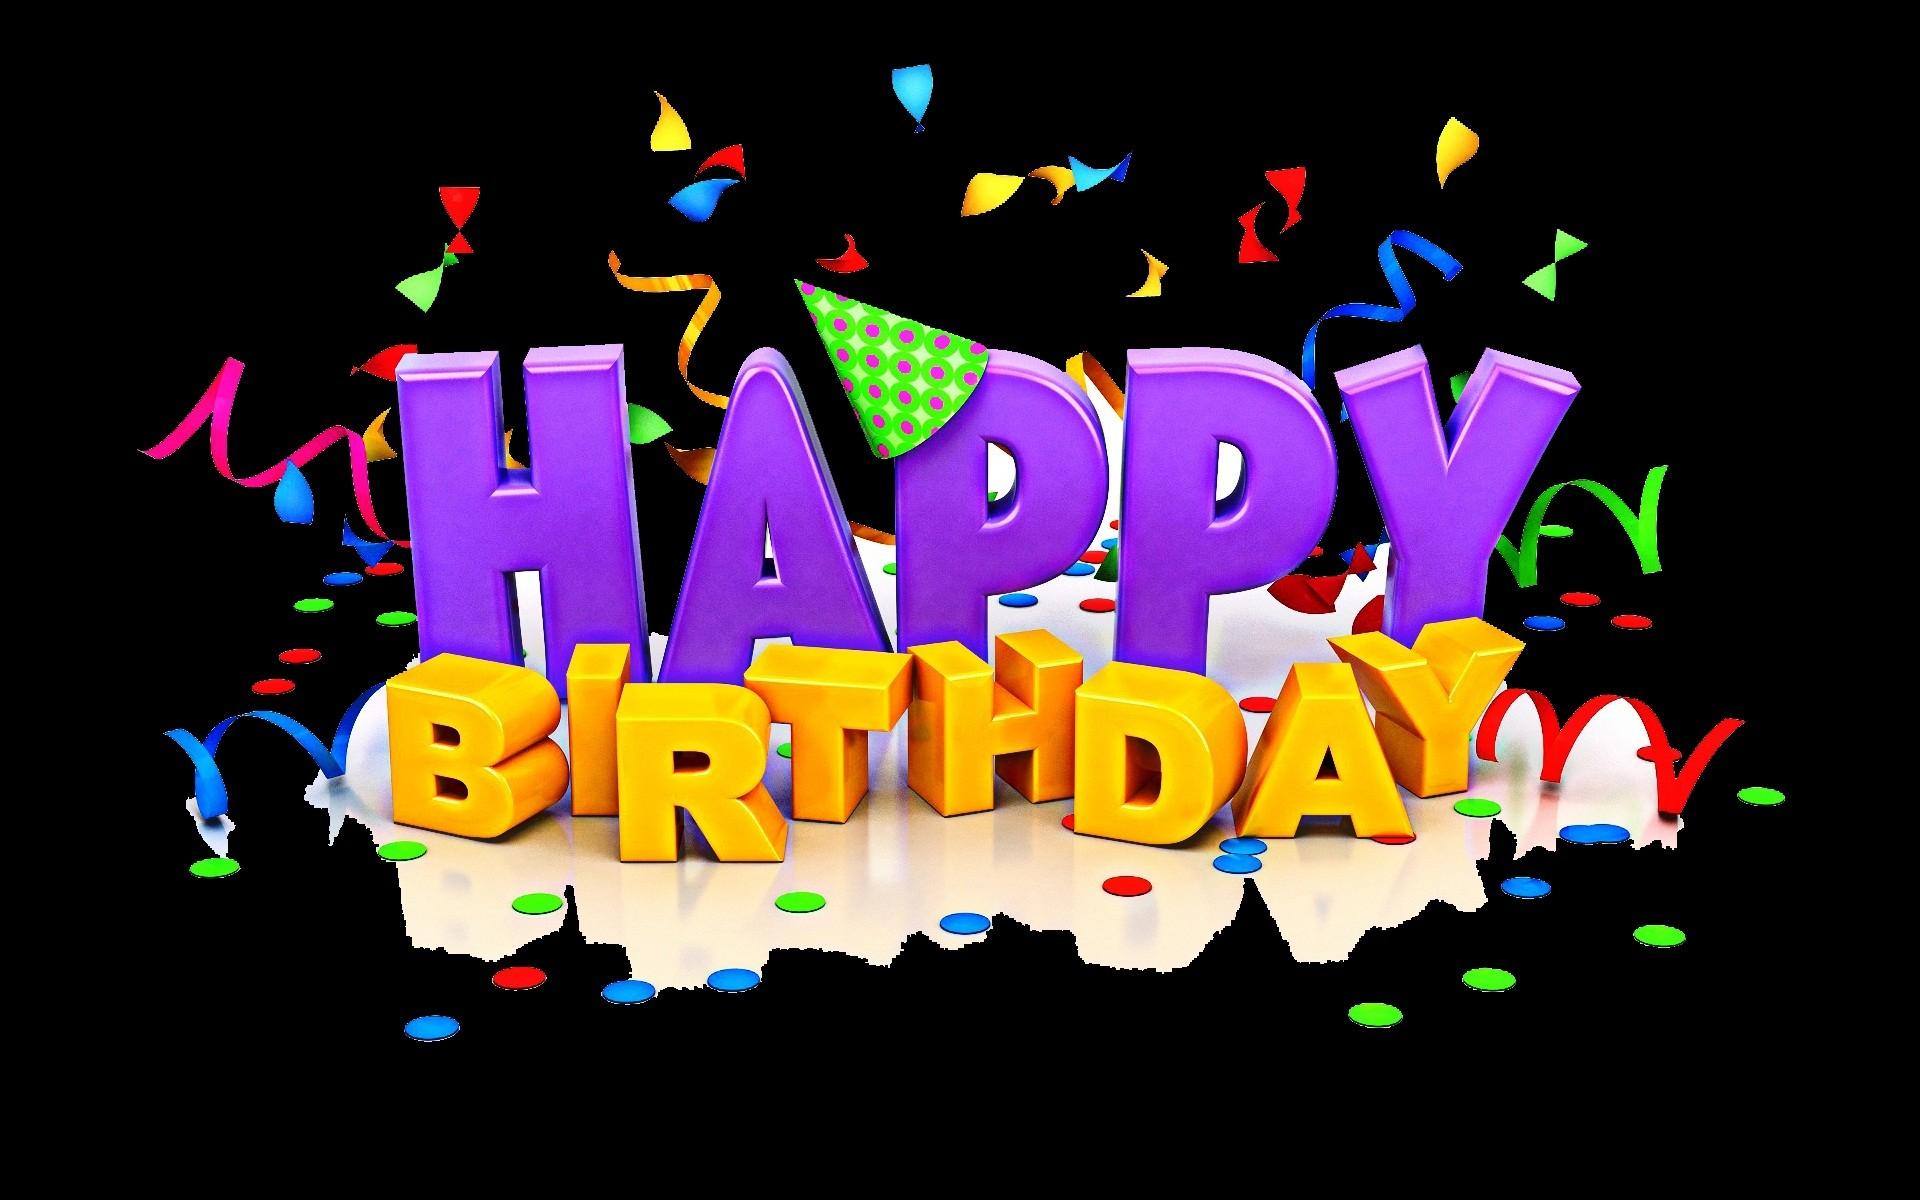 happy birthday by Moni Adler on 500px   Happy Birthday   Pinterest   Happy  birthday, Birthdays and Birthday cakes